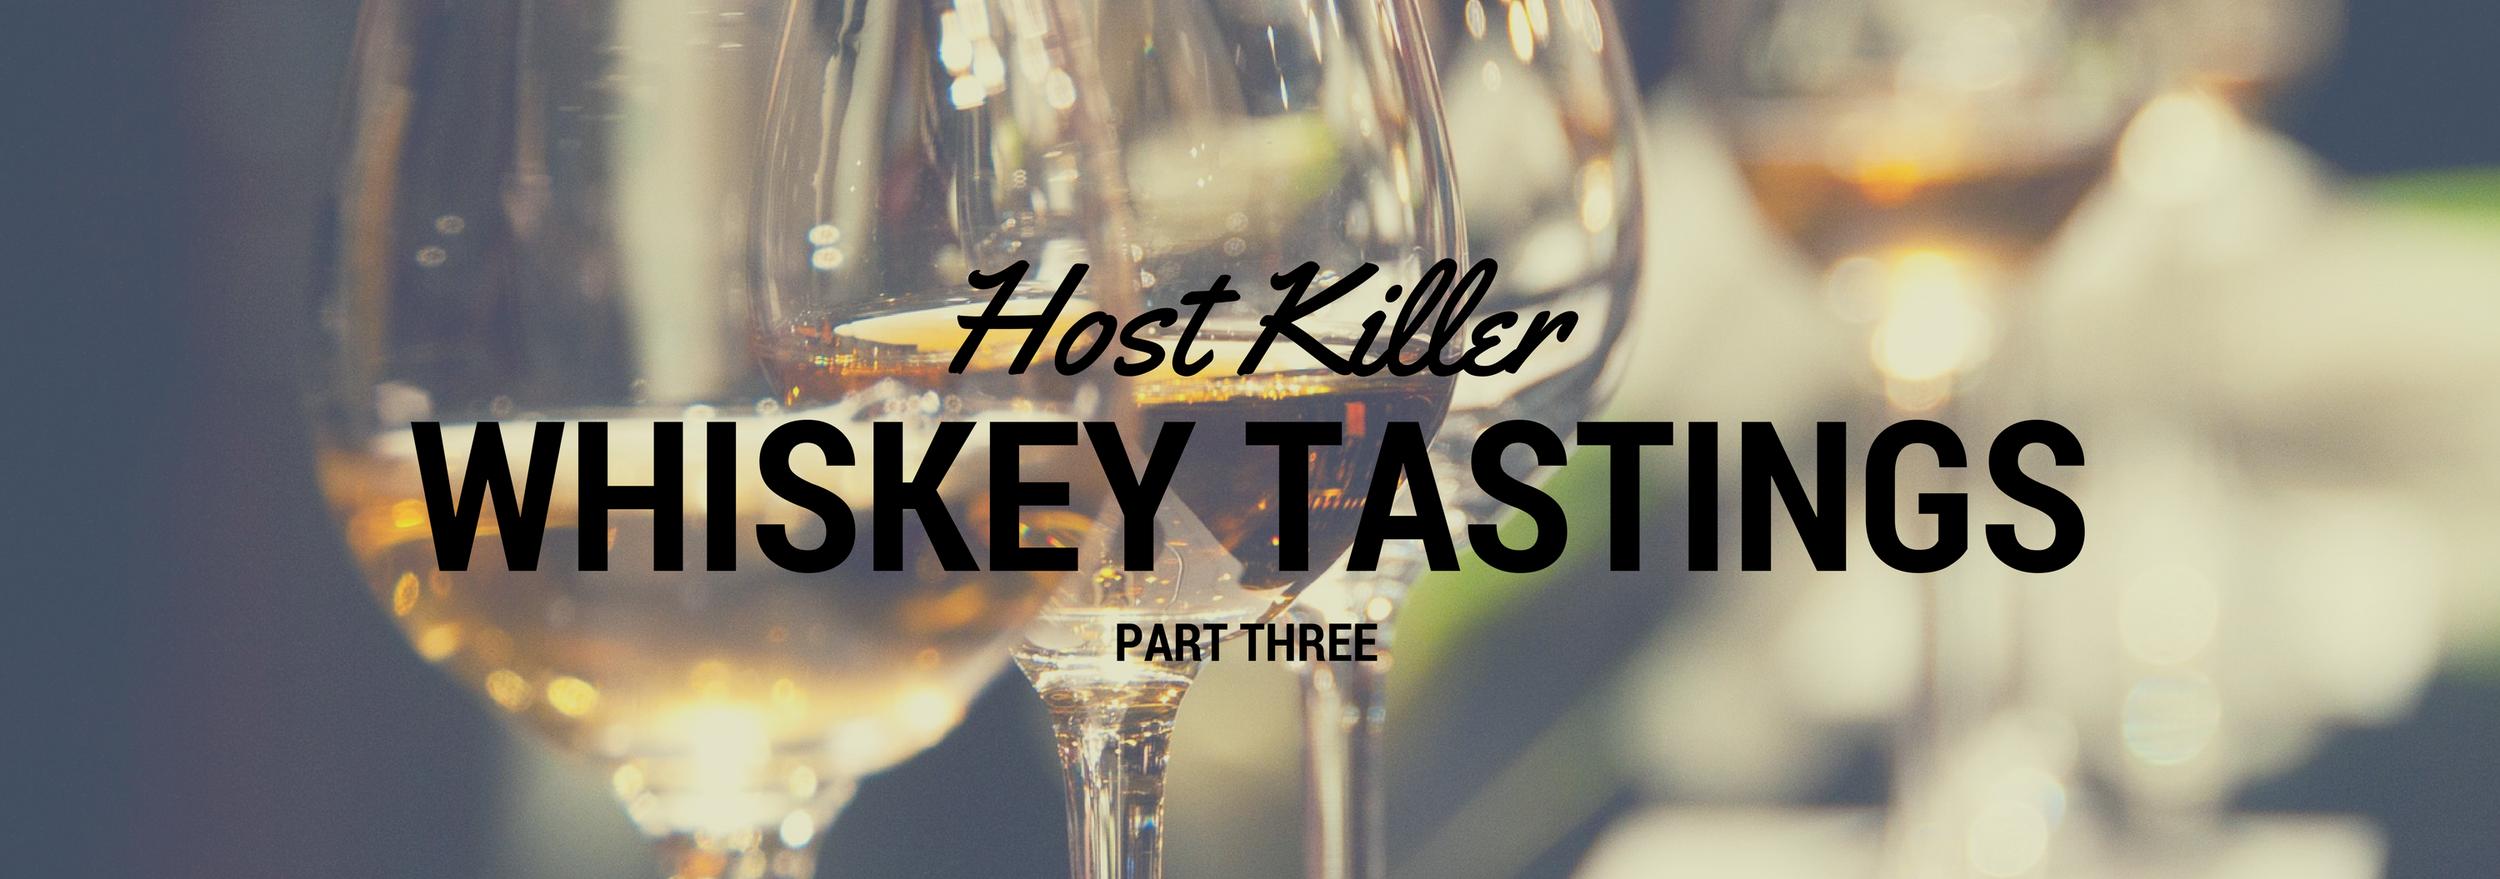 host-killer-tastings-part-three.png